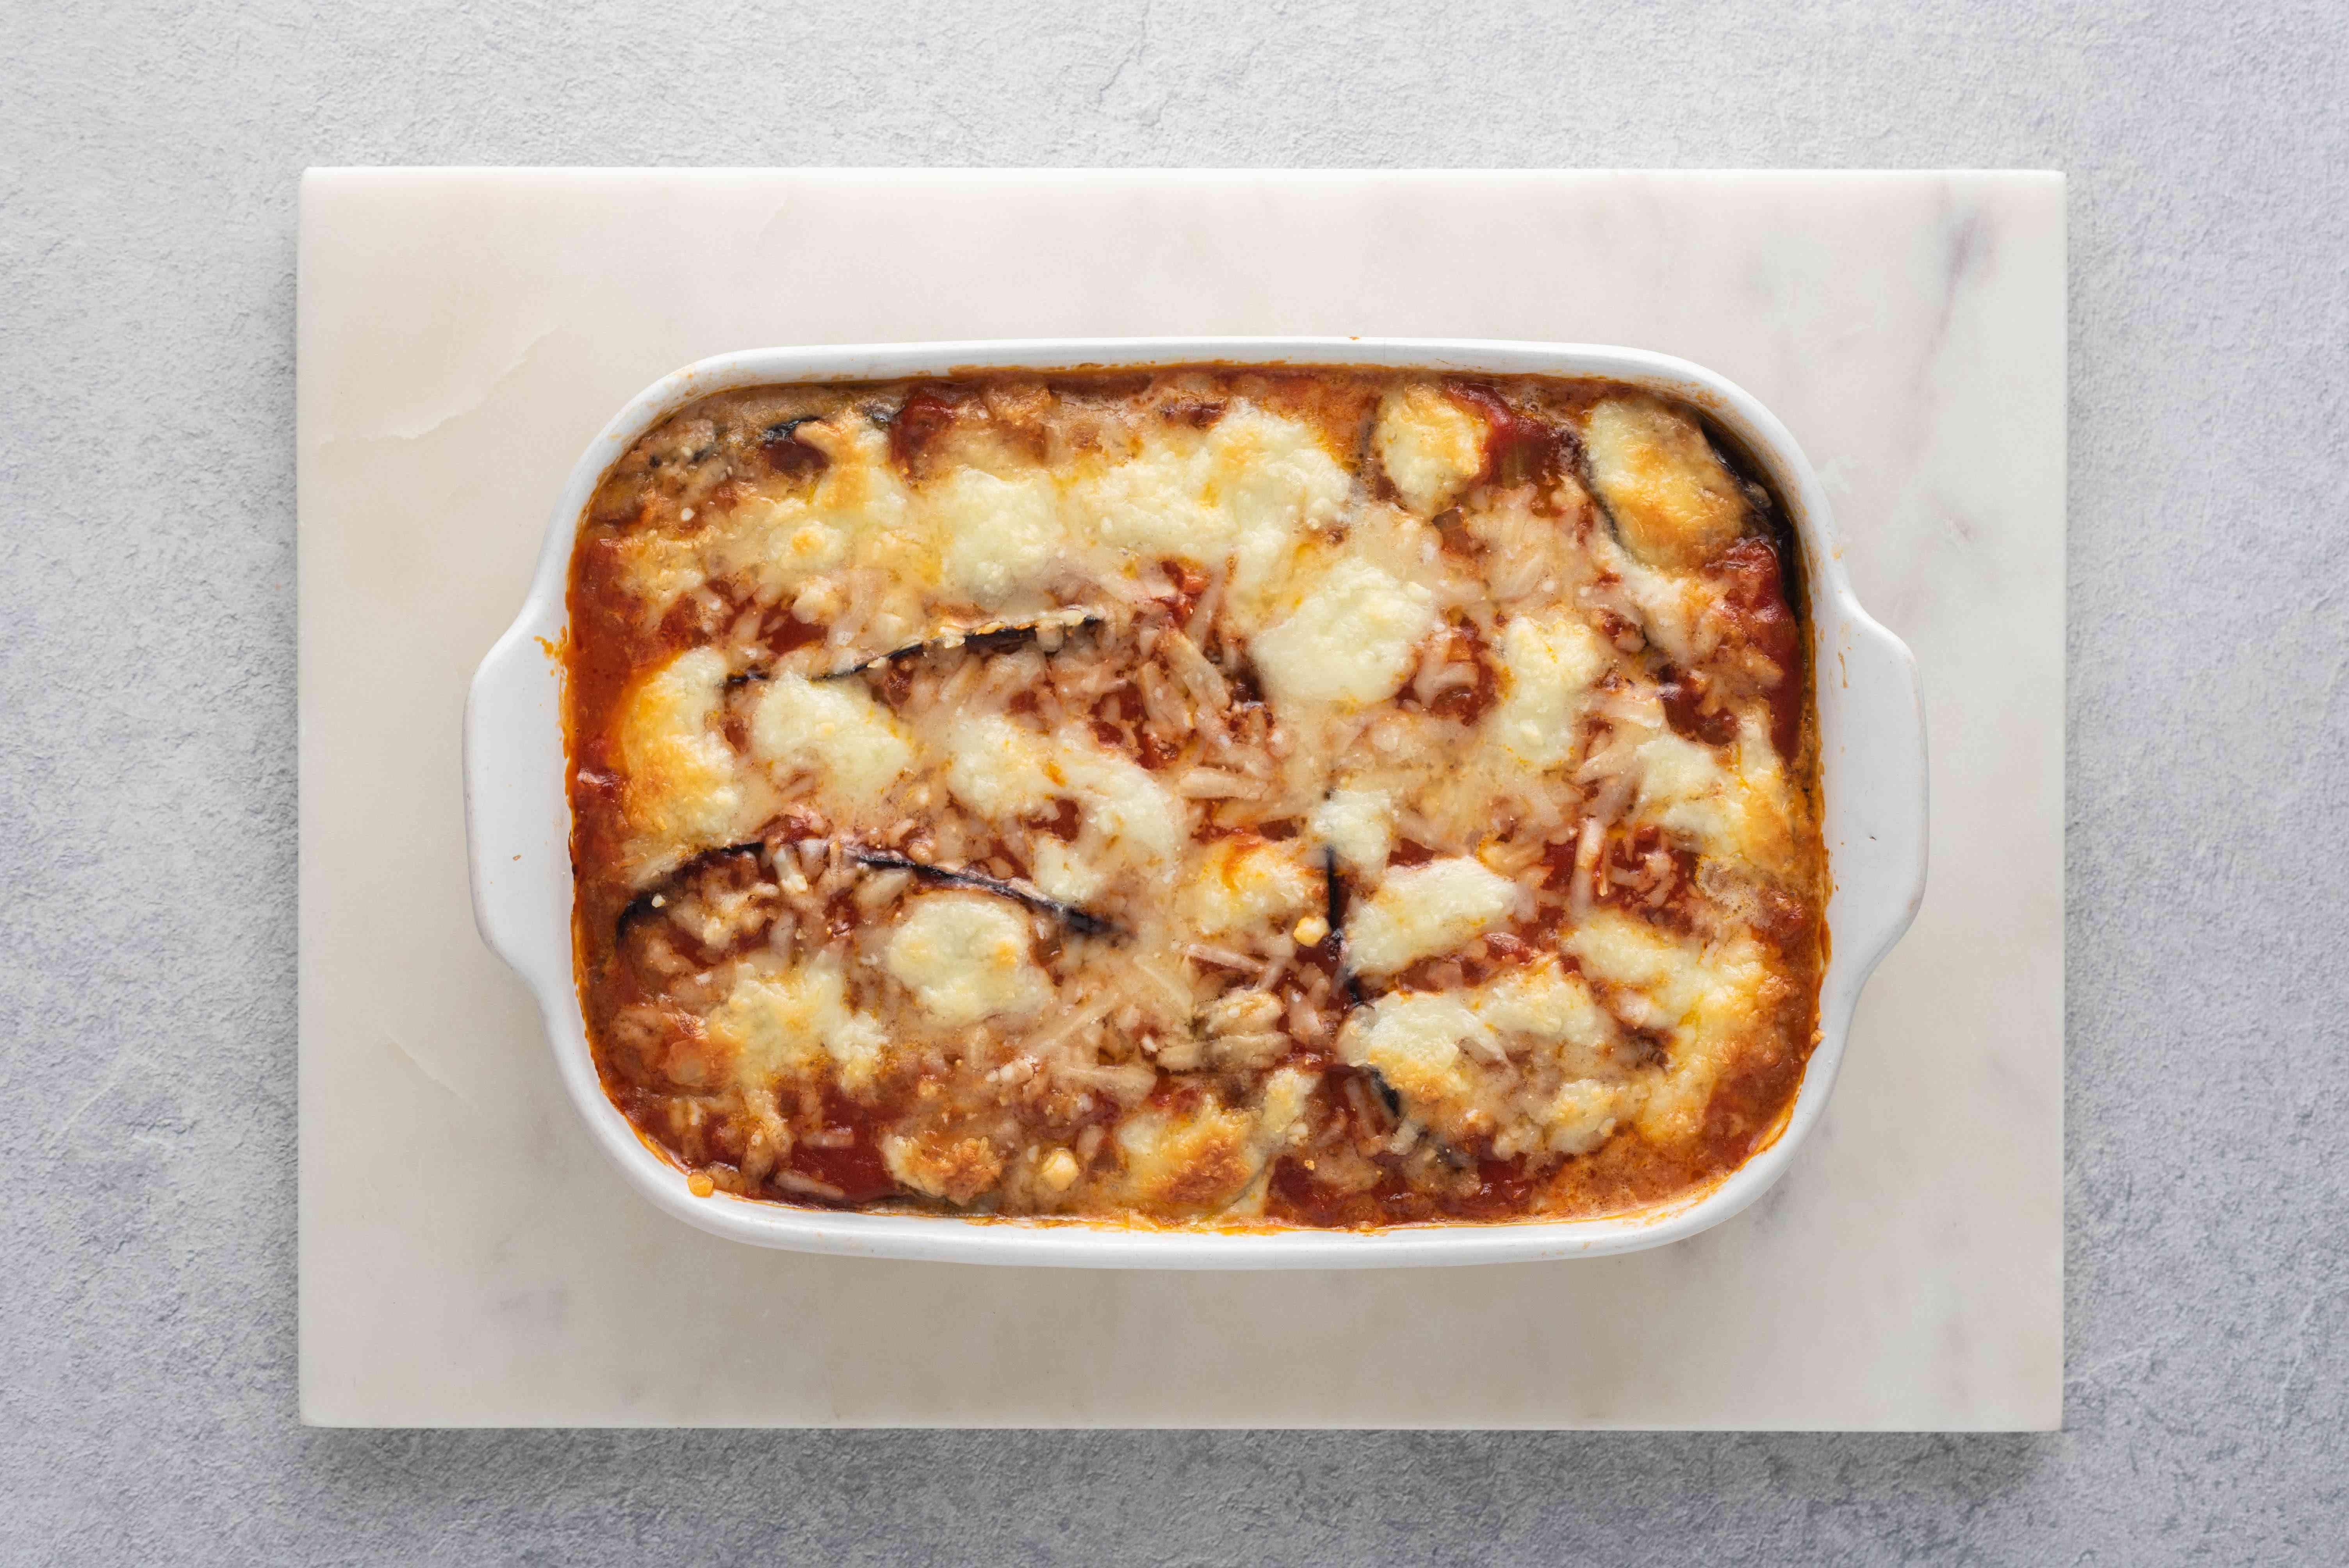 Authentic Eggplant Parmesan (Parmigiana Di Melanzane) in a baking dish